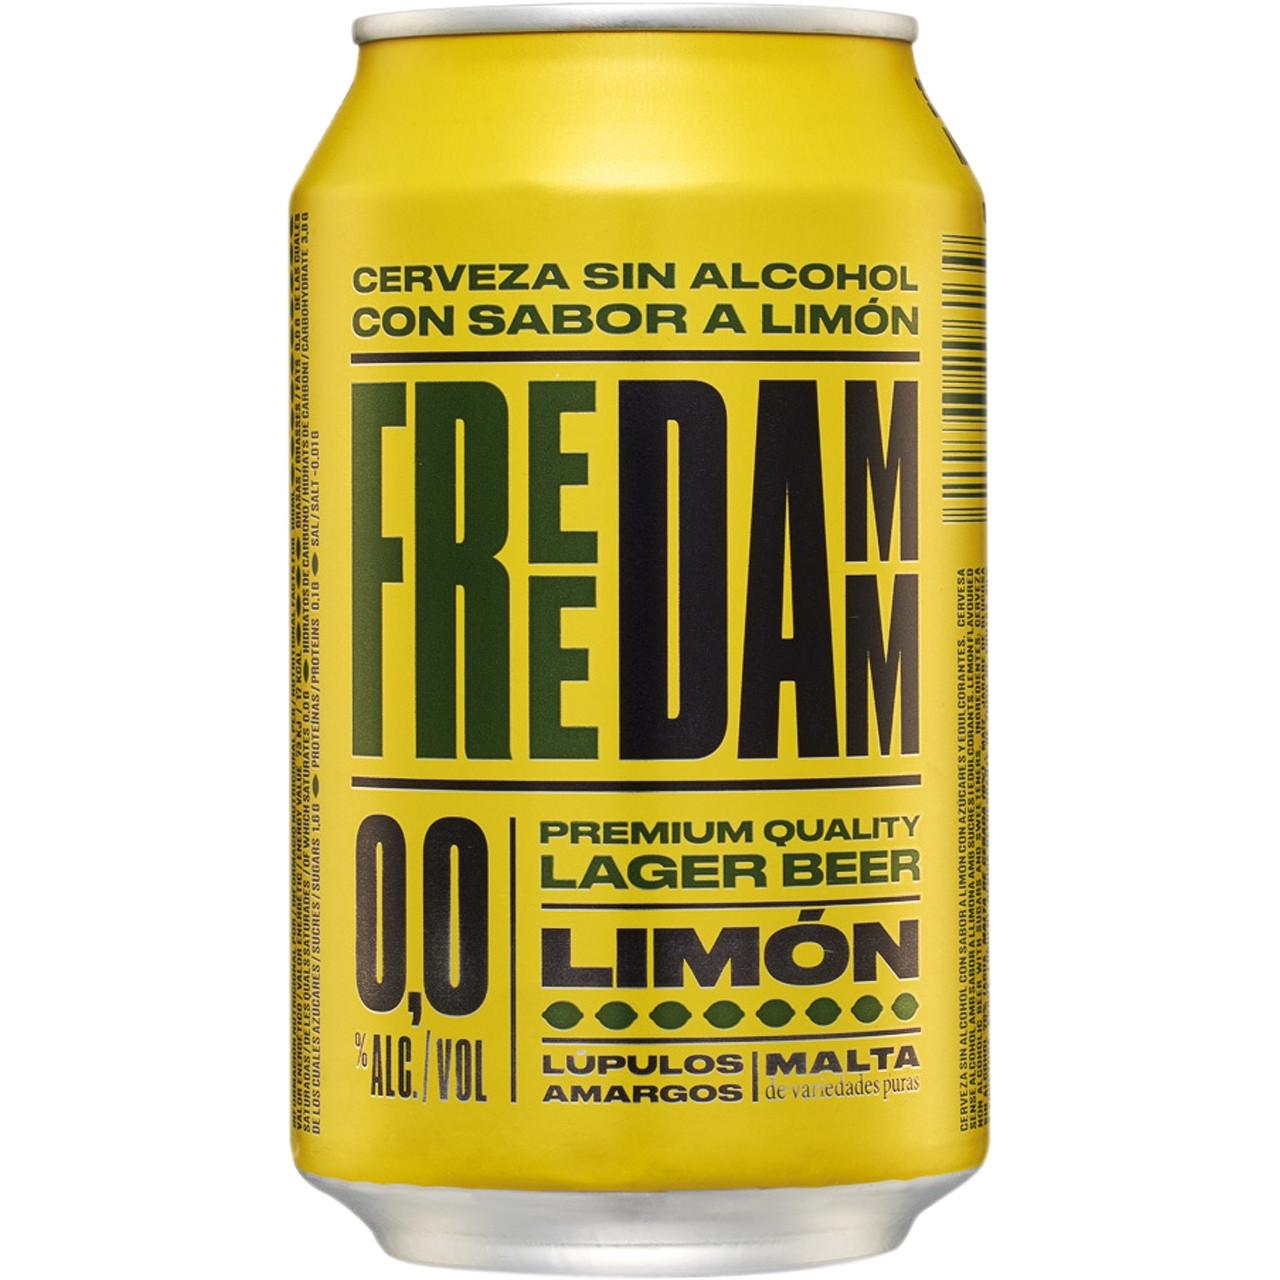 Llauna free lemon